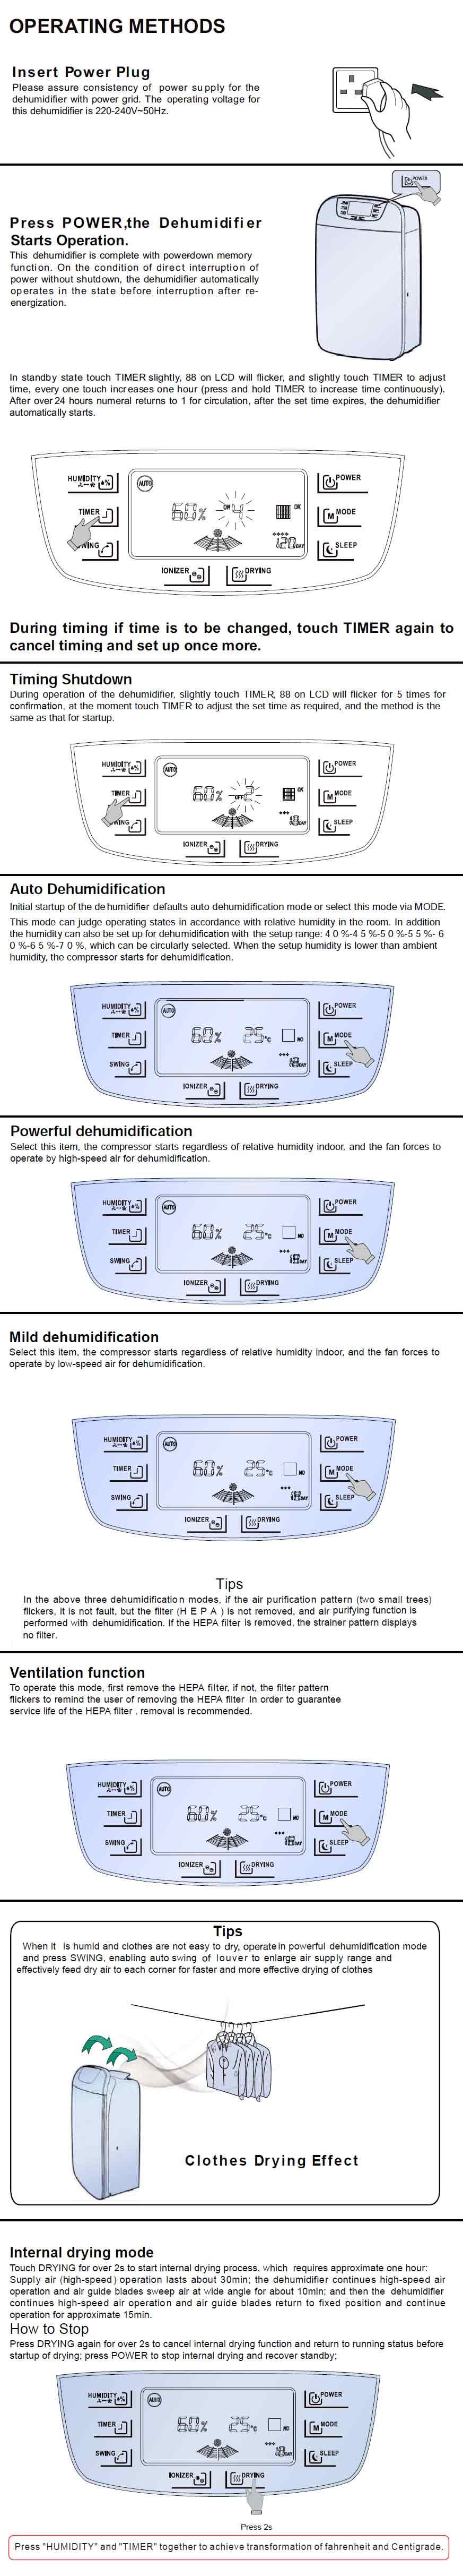 Operating-Manual